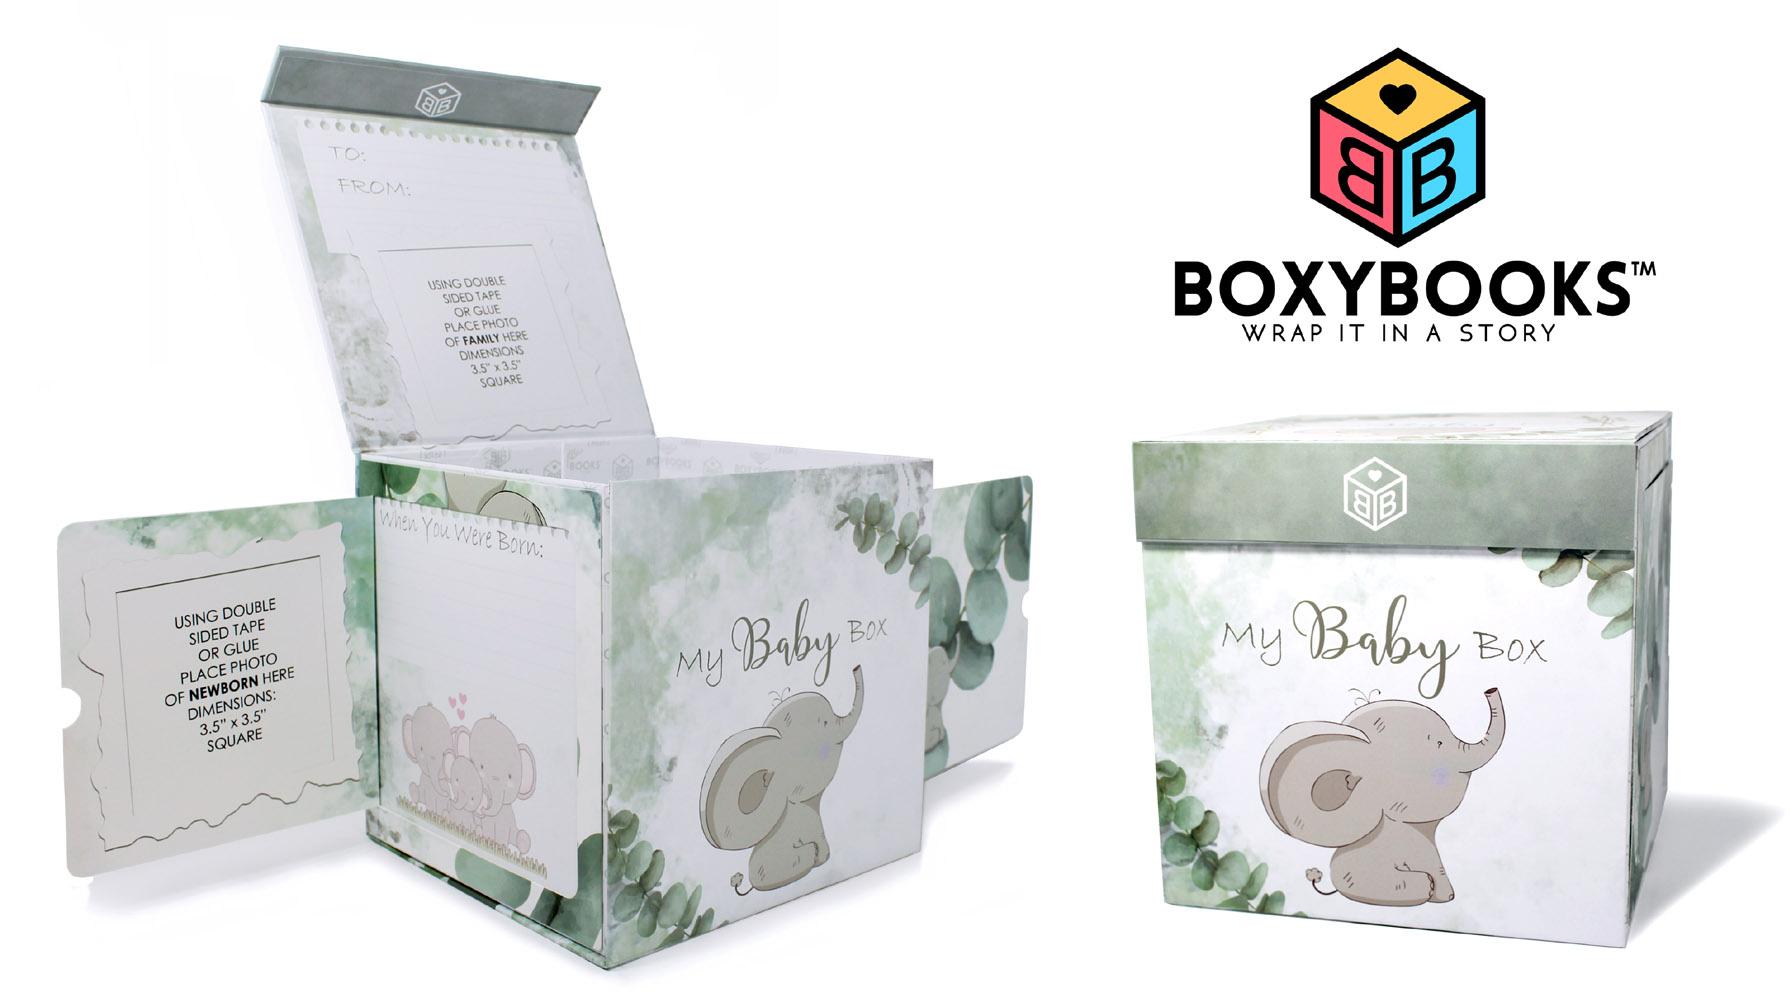 Baby box copy